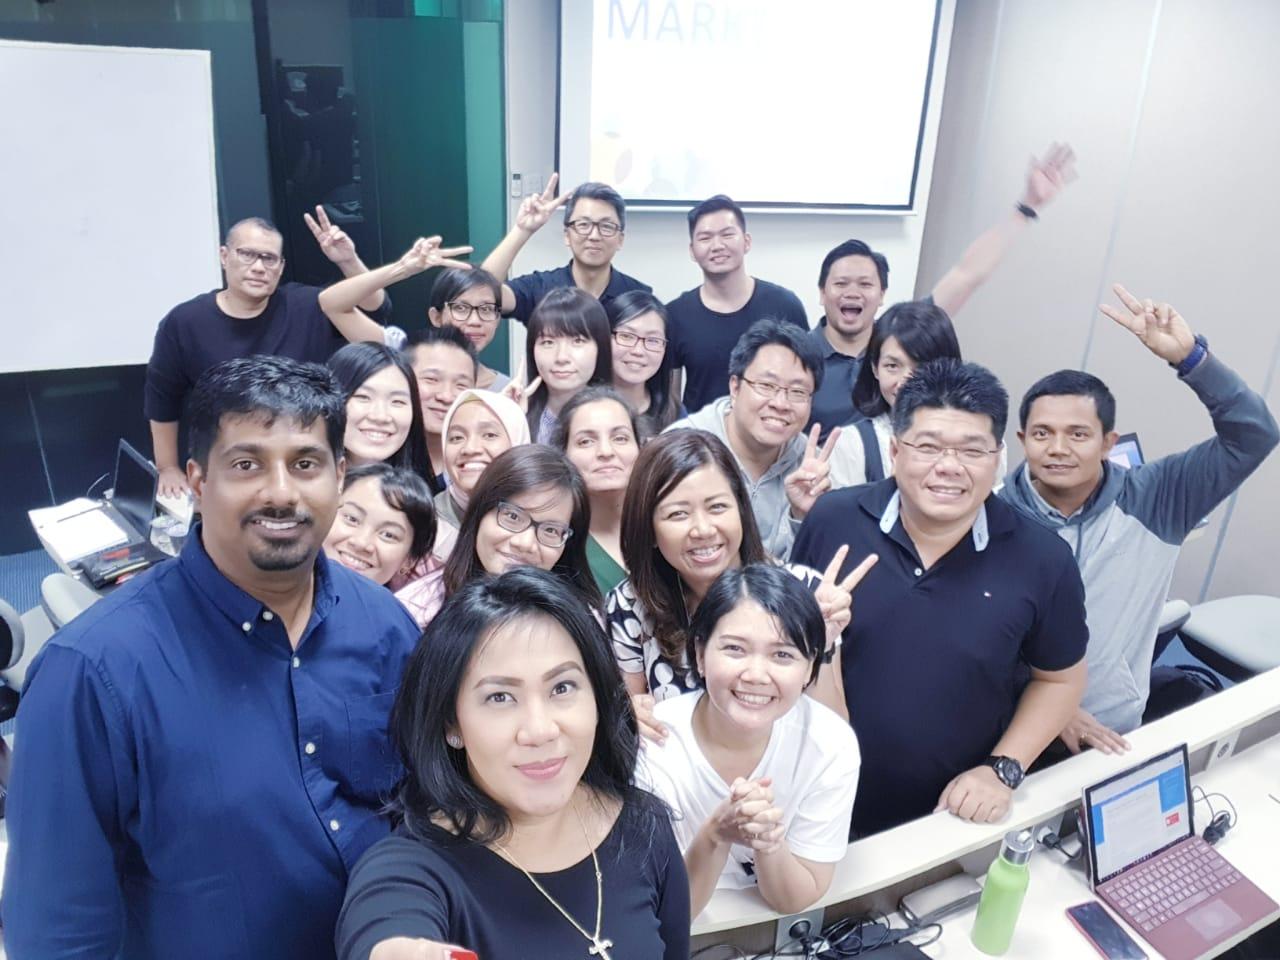 Advanced Digital Marketing Training at Universitas Pelita Harapan